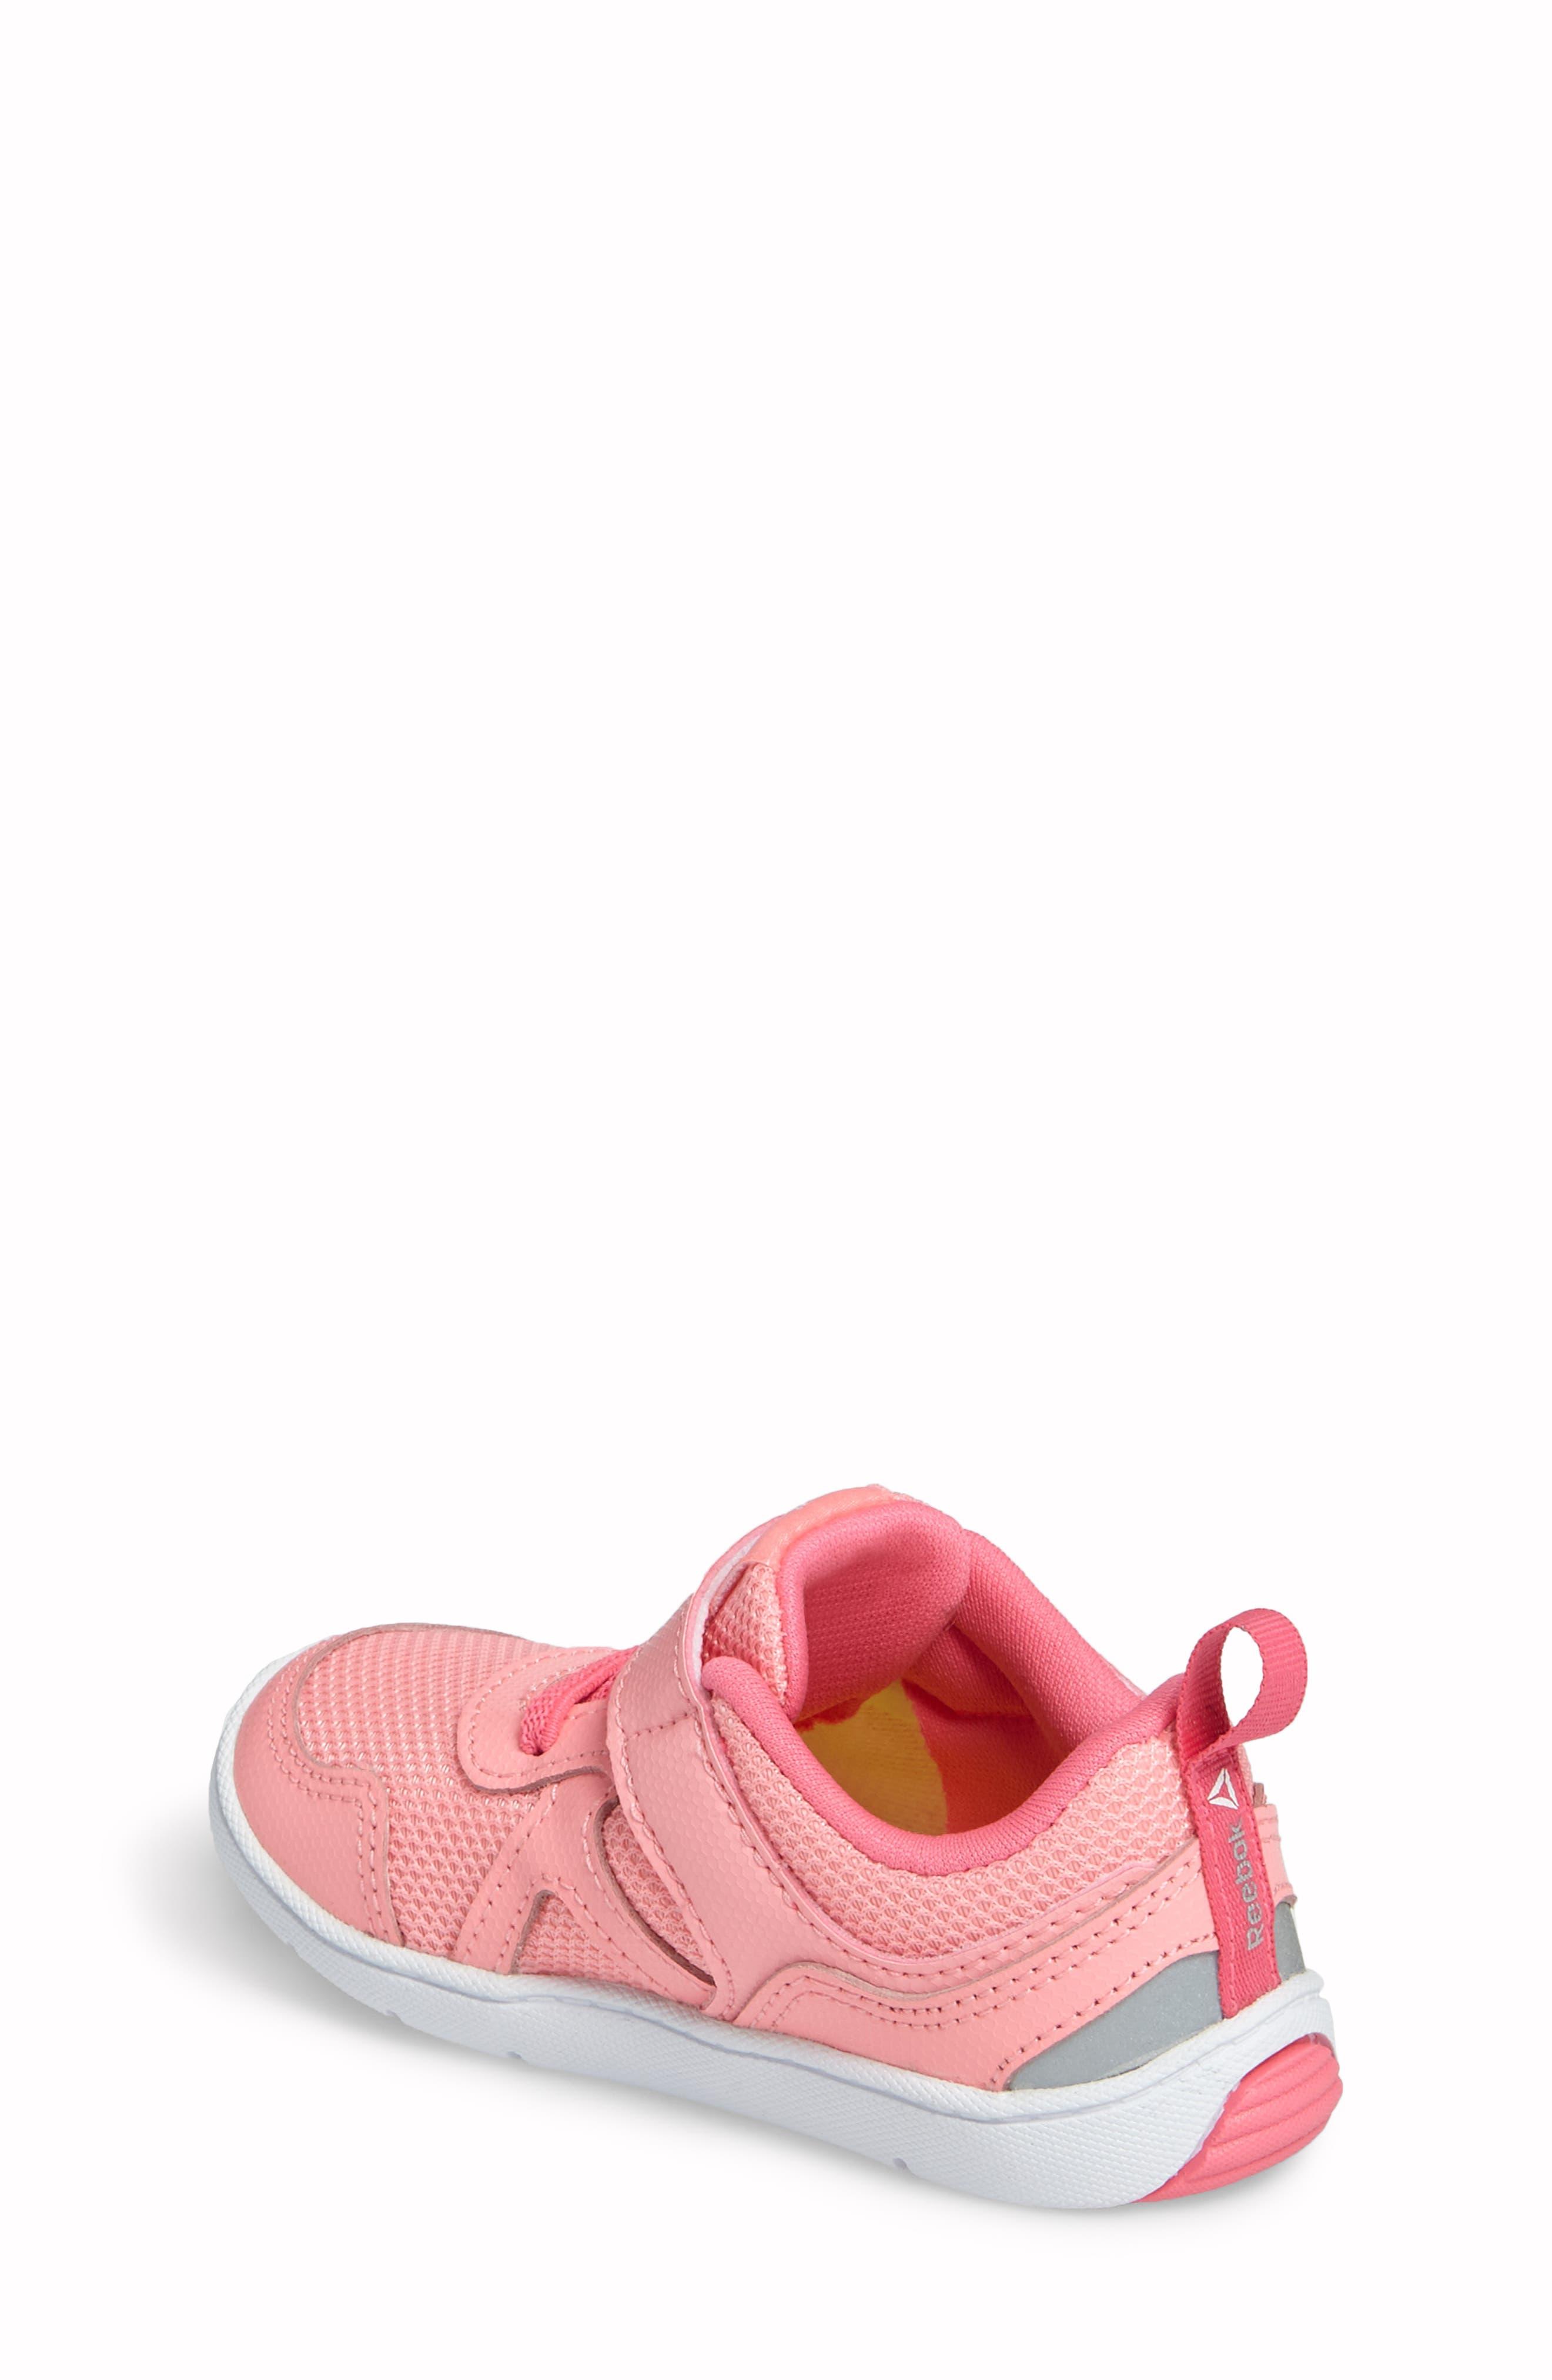 Ventureflex Stride 5.0 Sneaker,                             Alternate thumbnail 4, color,